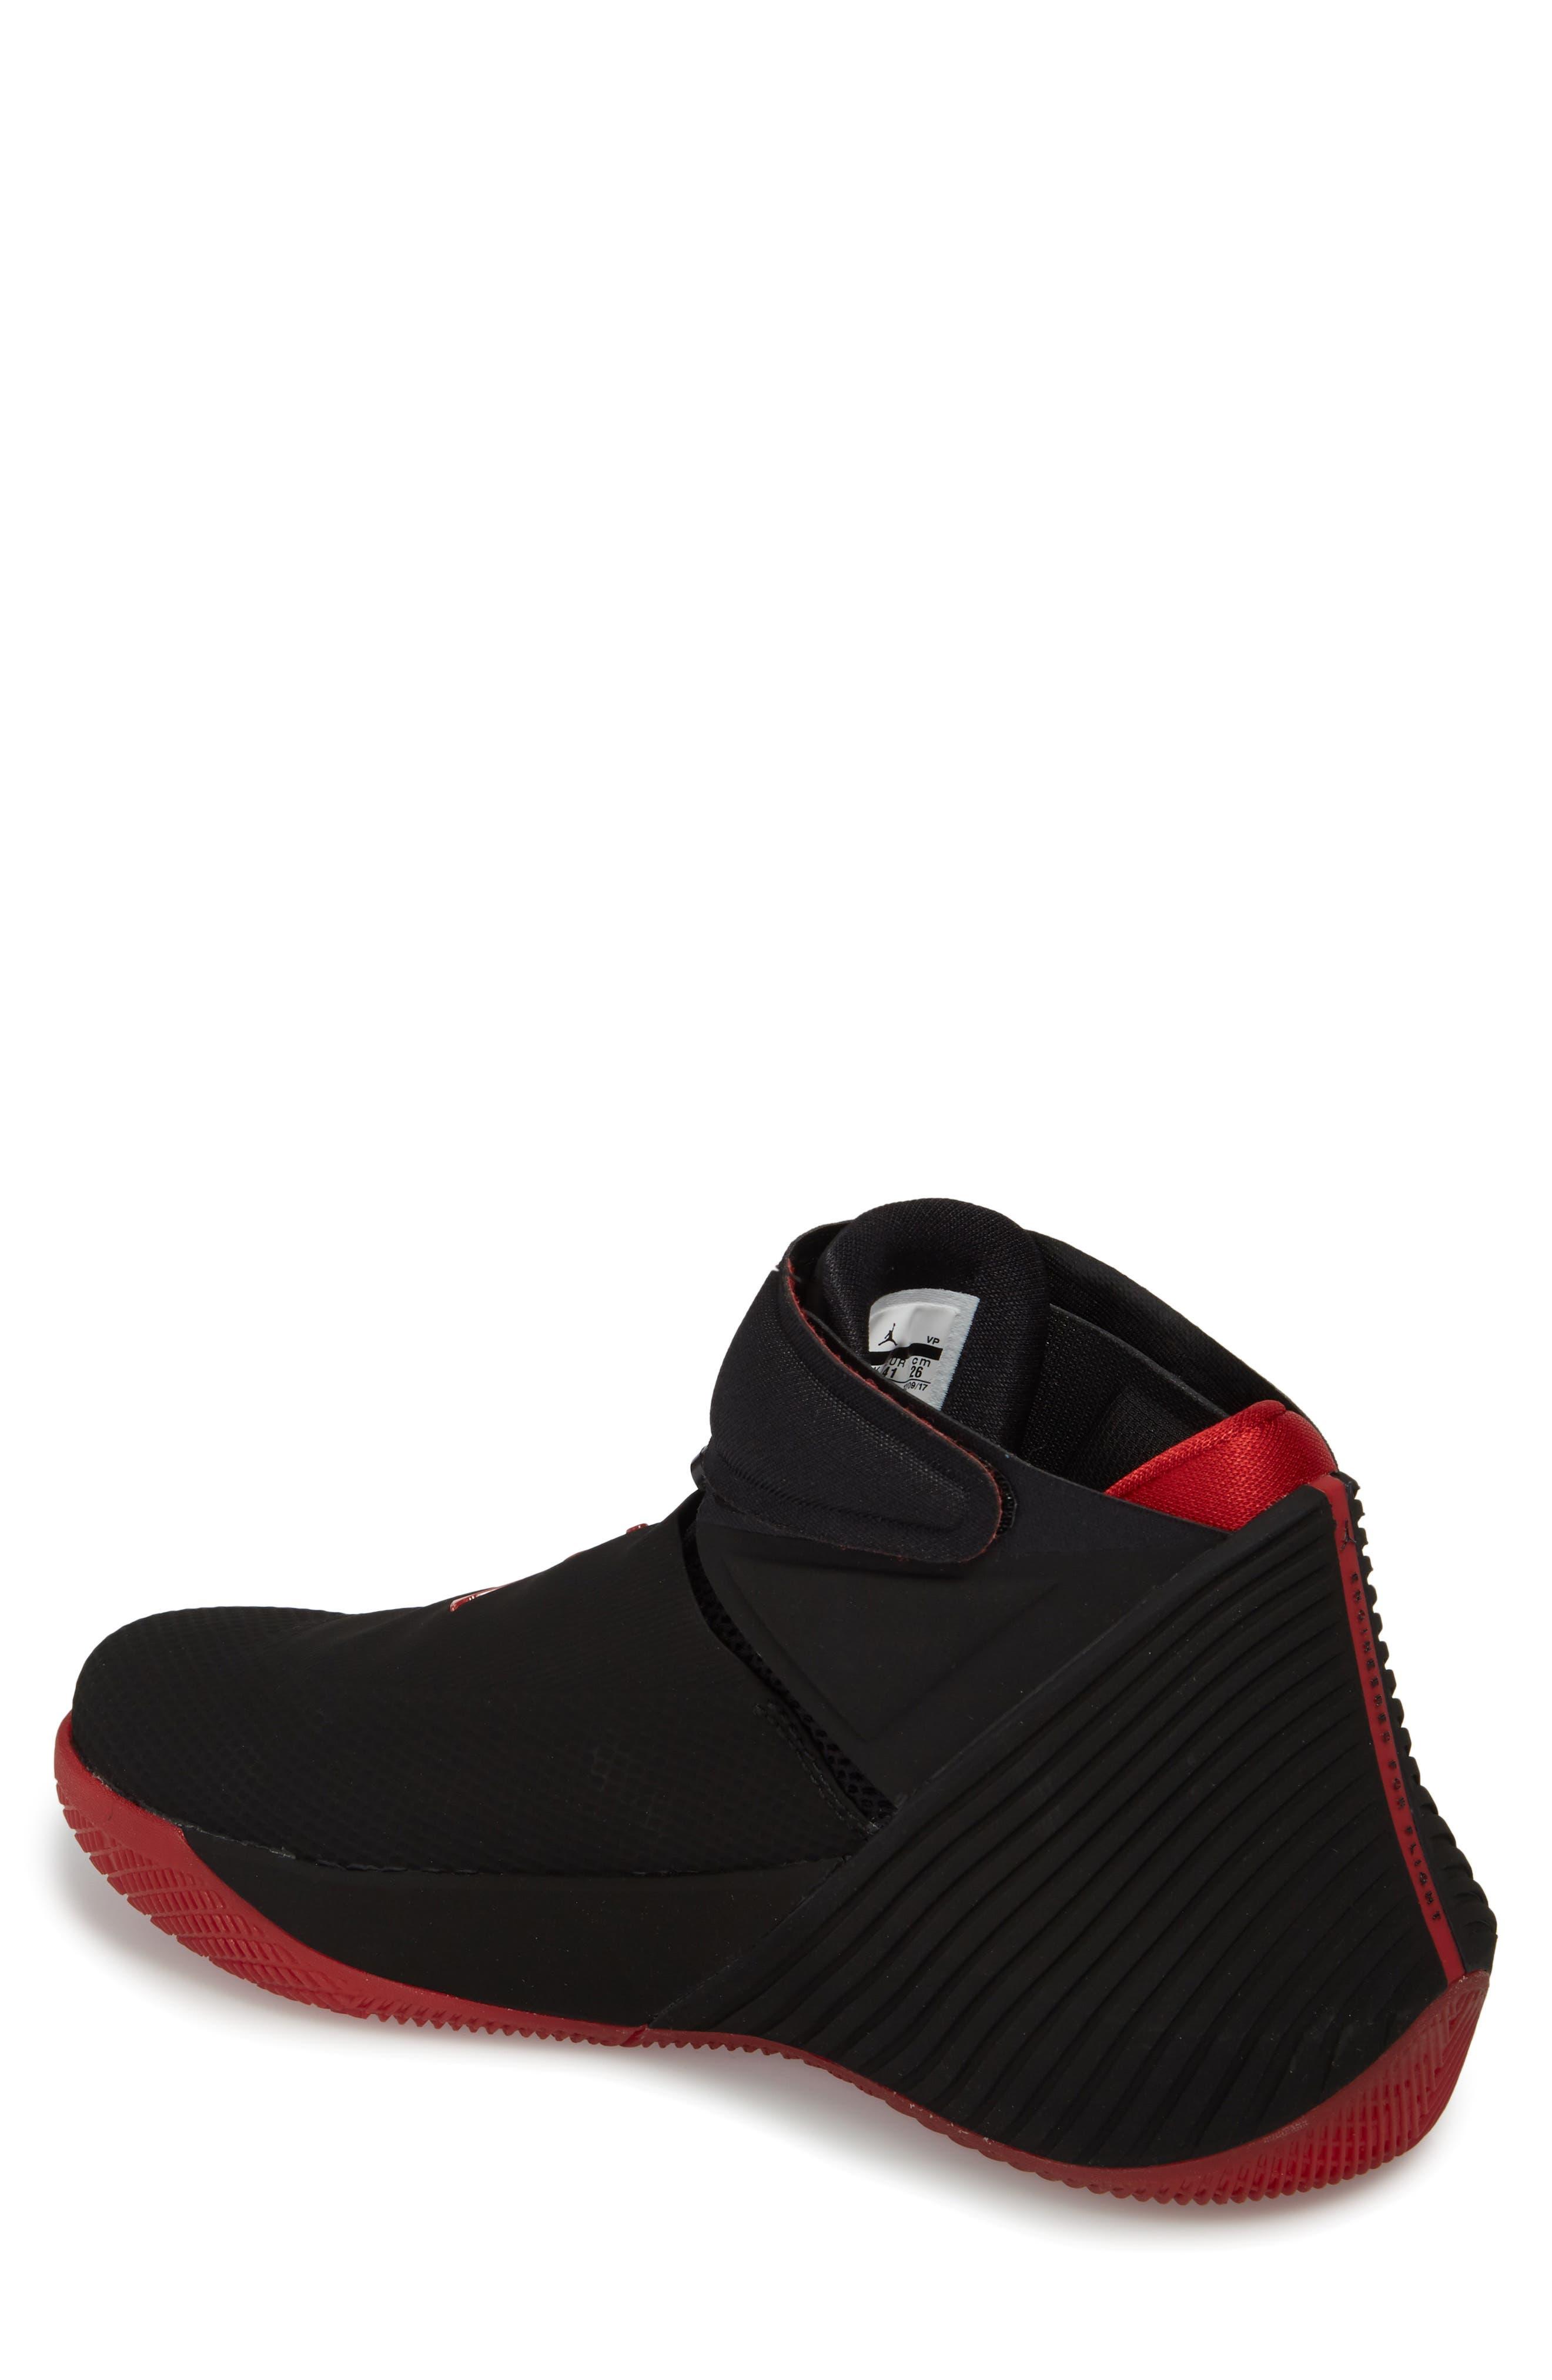 Jordan 'Why Not?' Zero.1 Basketball Shoe,                             Alternate thumbnail 2, color,                             Black/ Hyper Royal